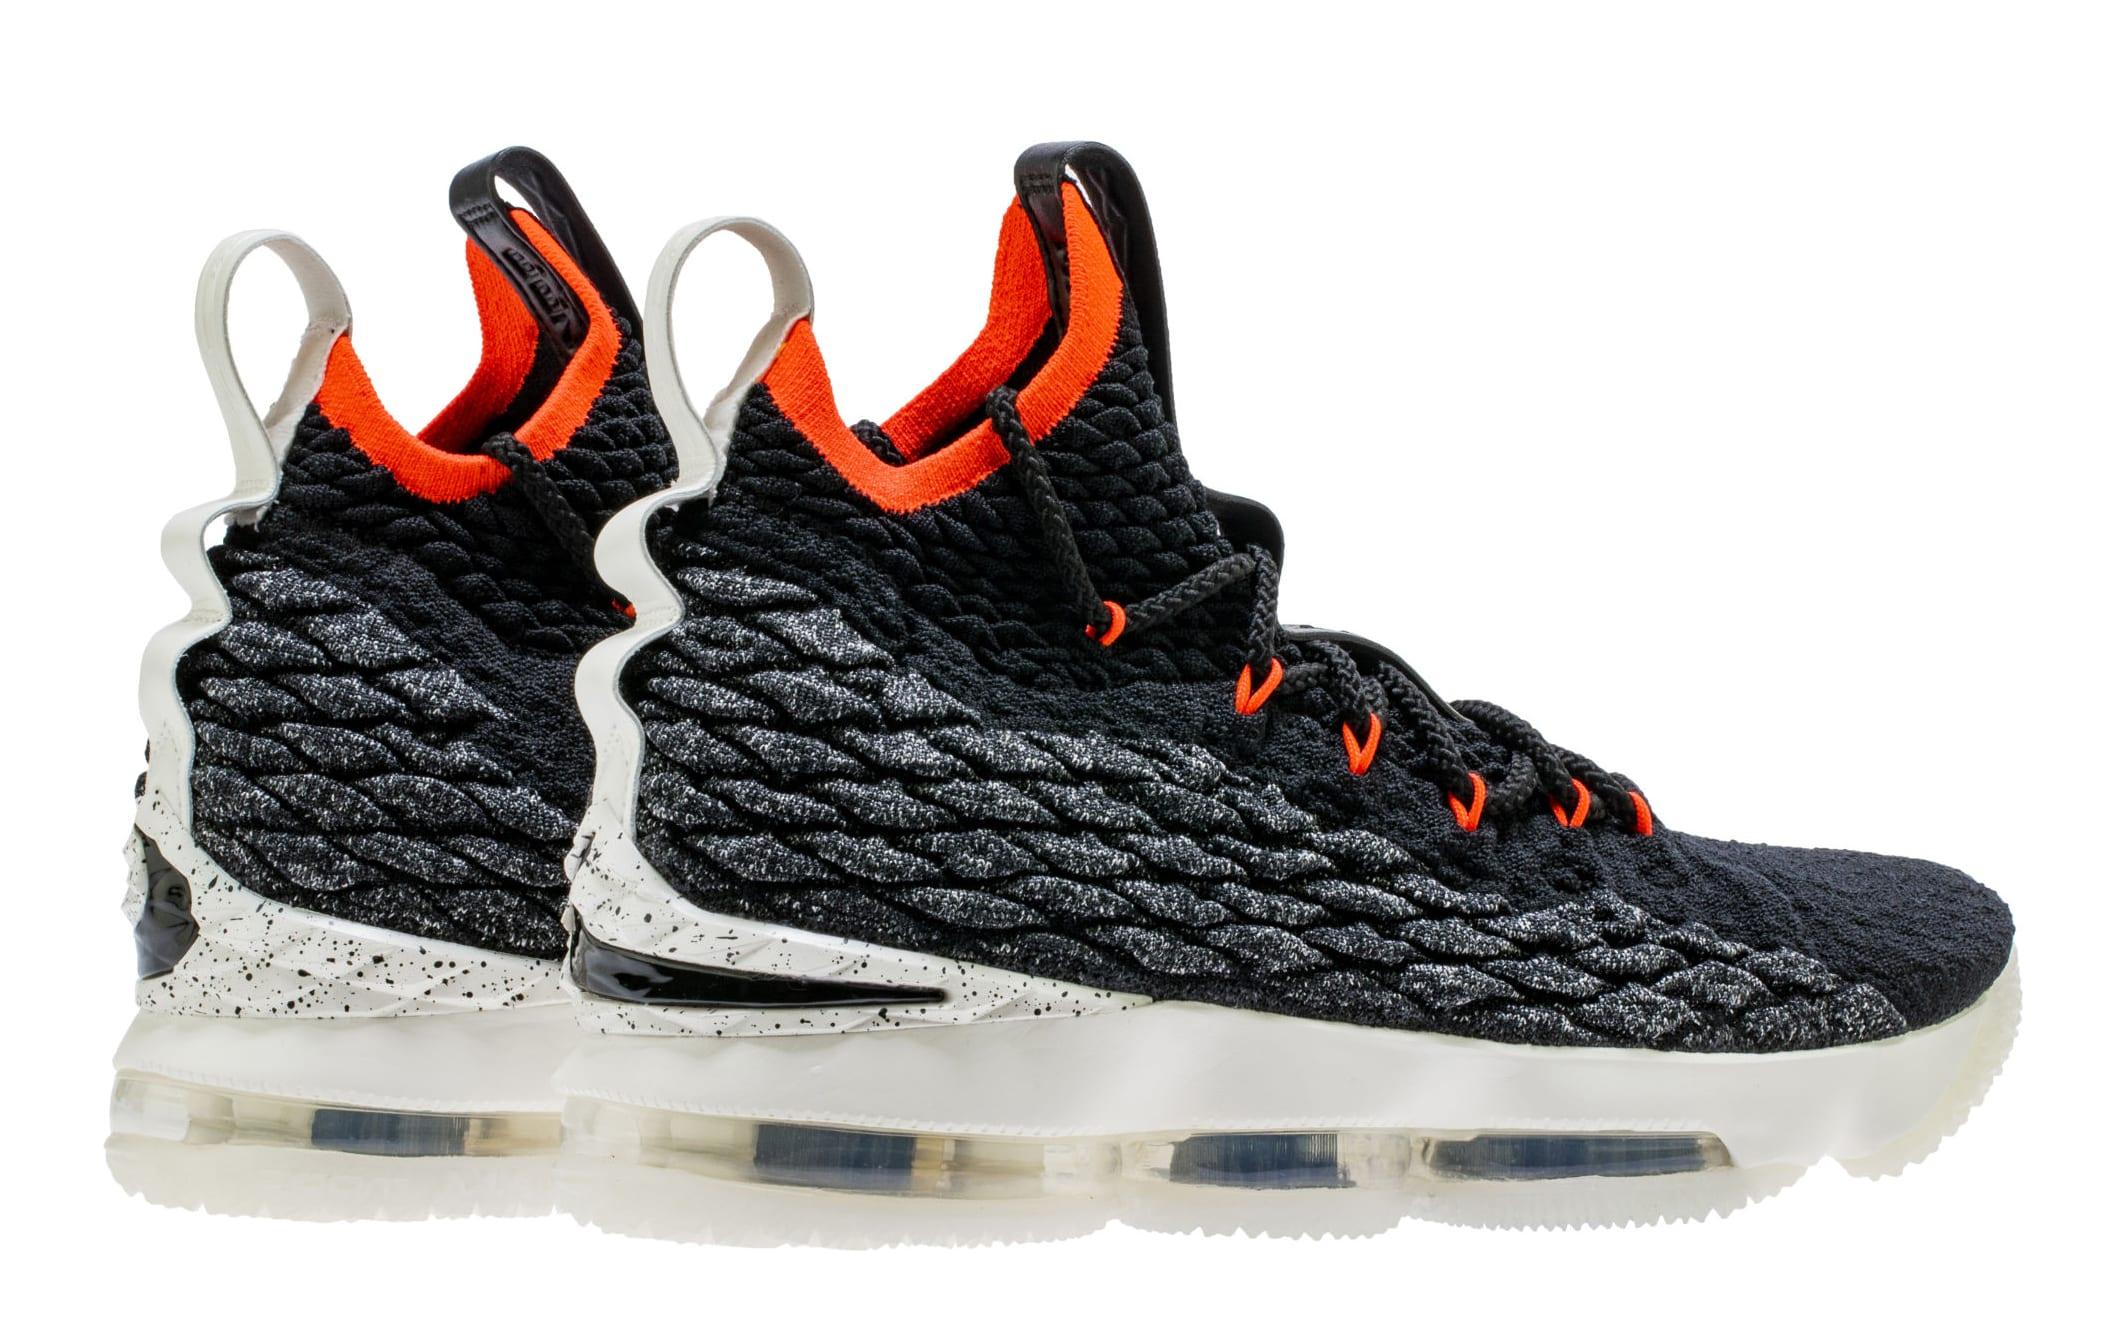 Nike LeBron 15 'Bright Crimson' AQ2363-002 (Heel)